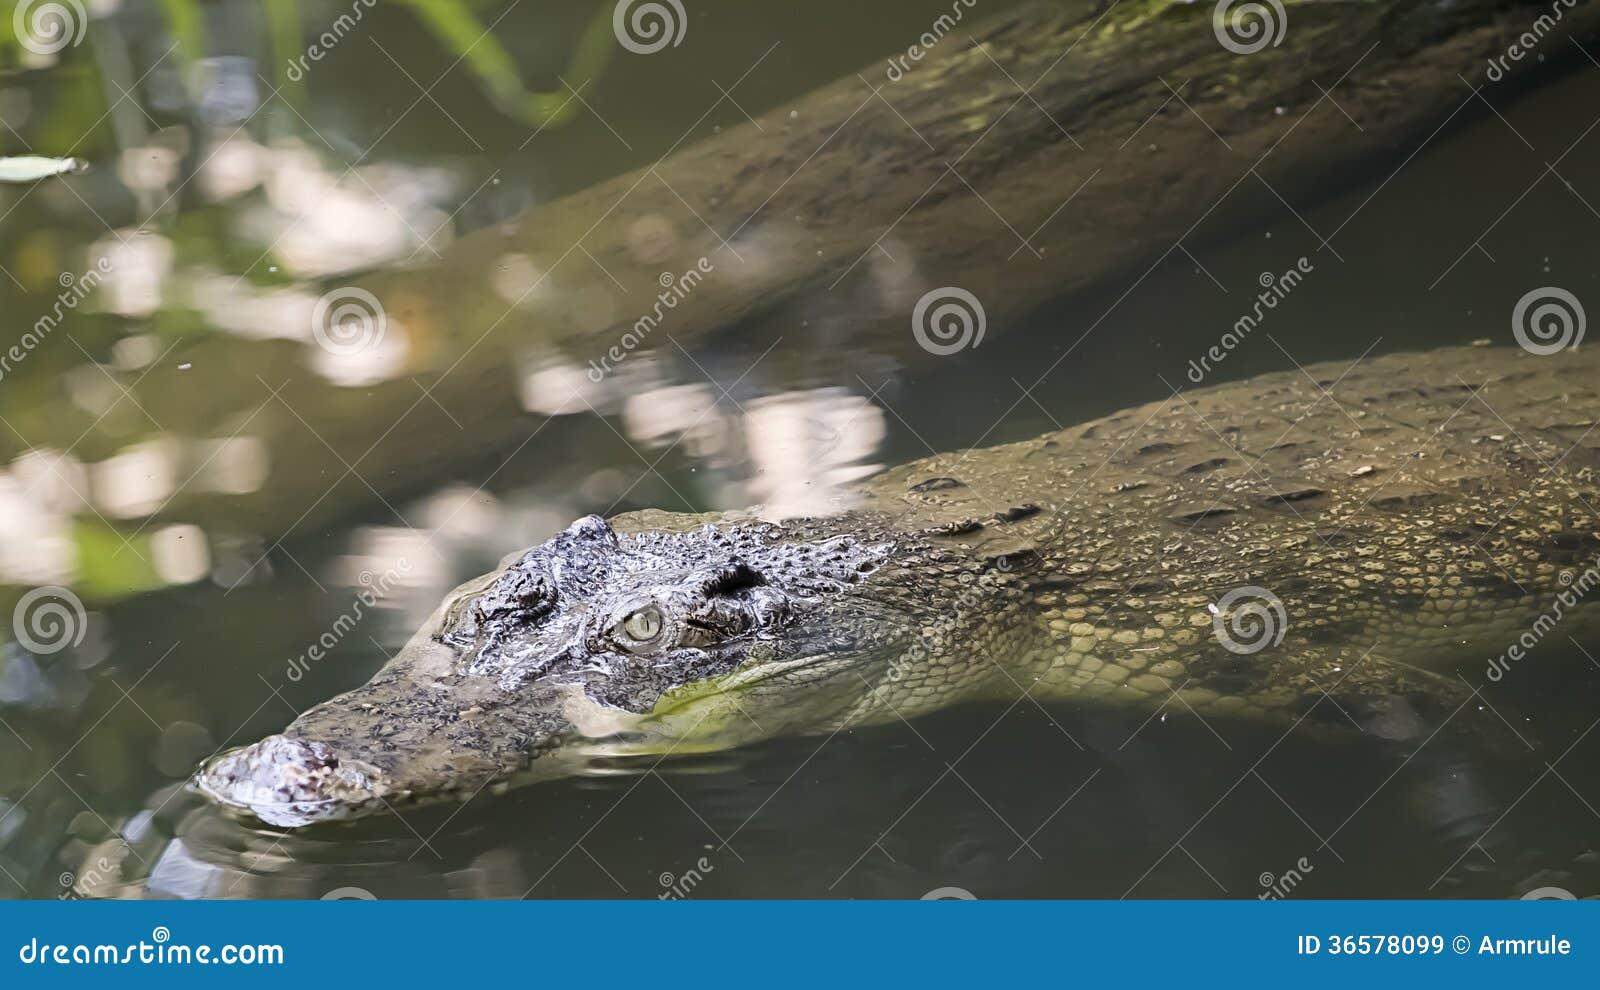 största krokodilen